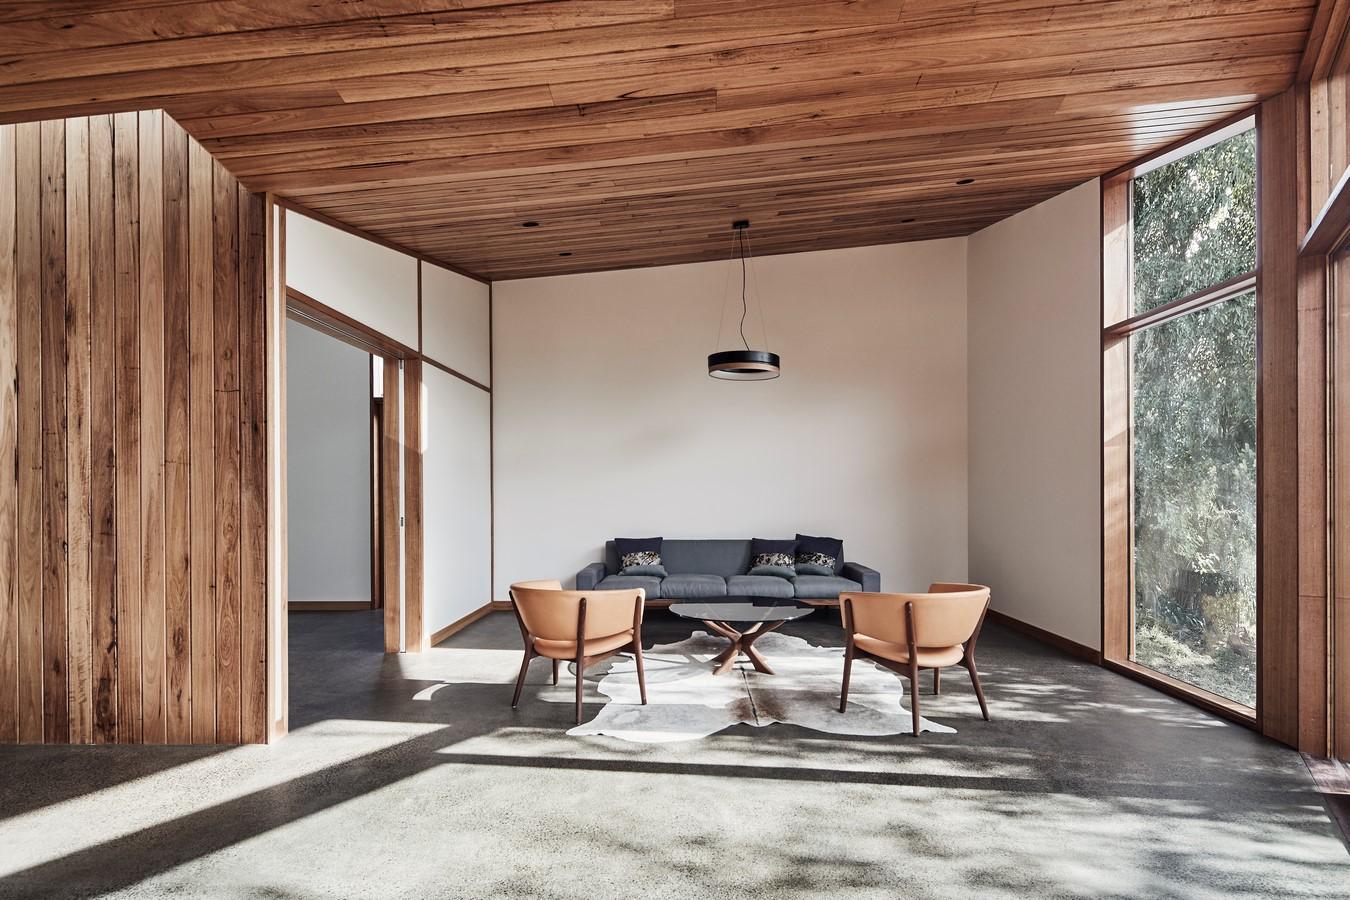 Barton House By Julie Firkin Architects - Sheet2